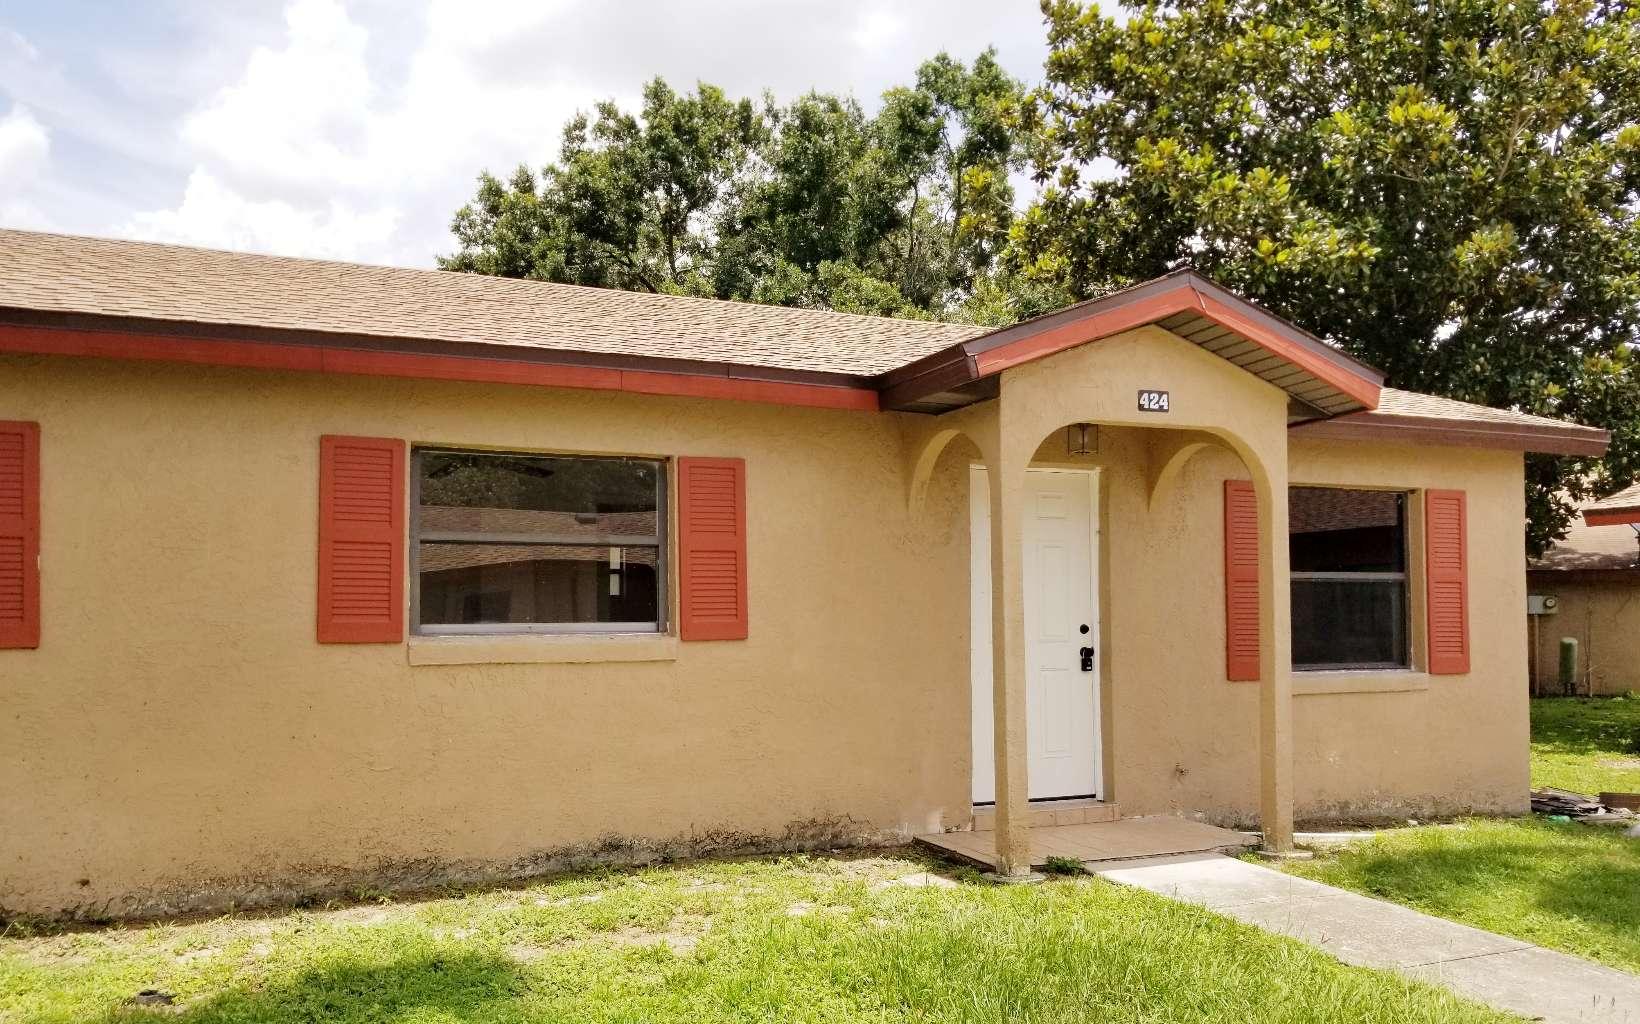 424 Las Palmas Cir, Avon Park, FL 33825